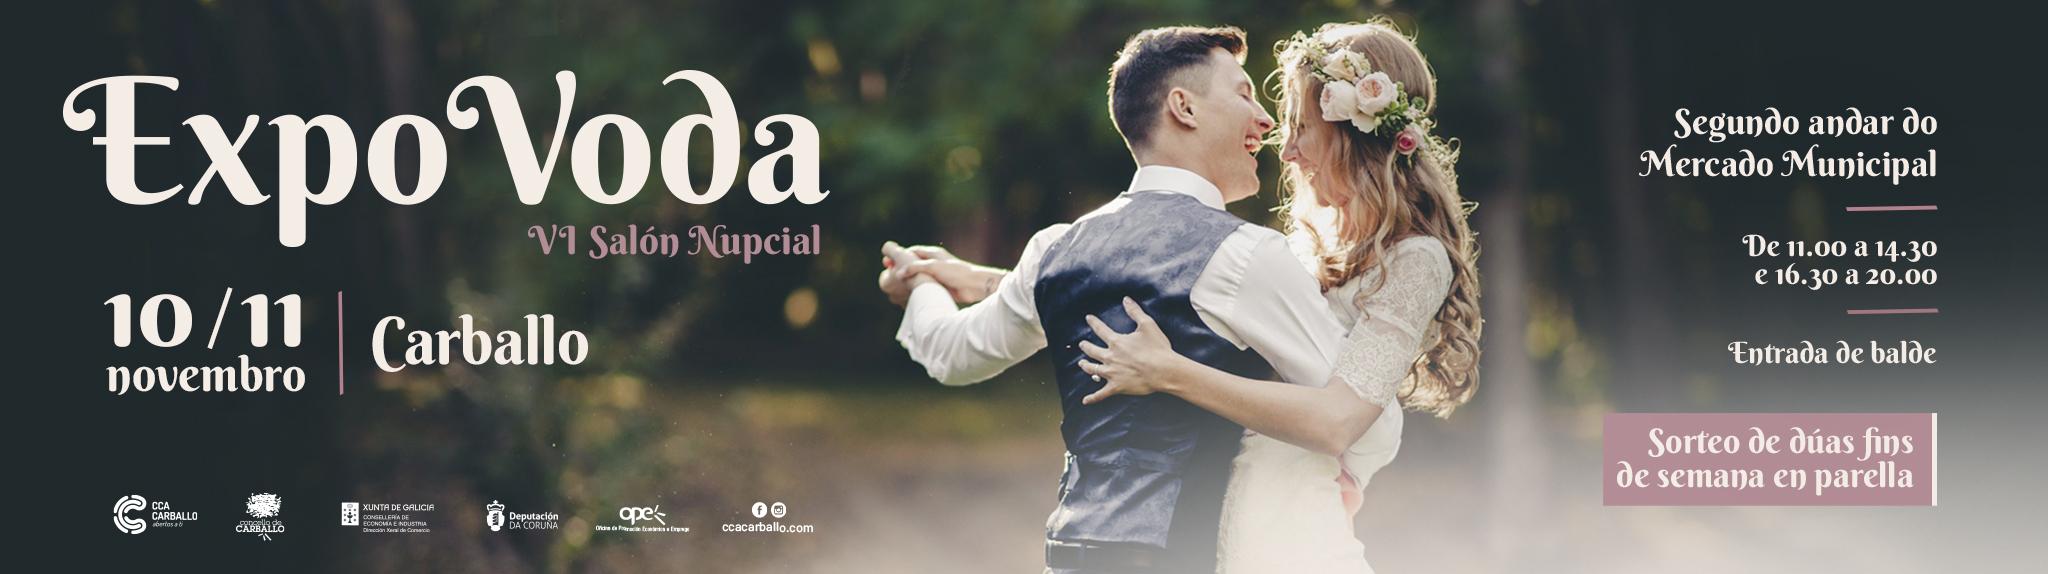 Expovoda_18-banner-web